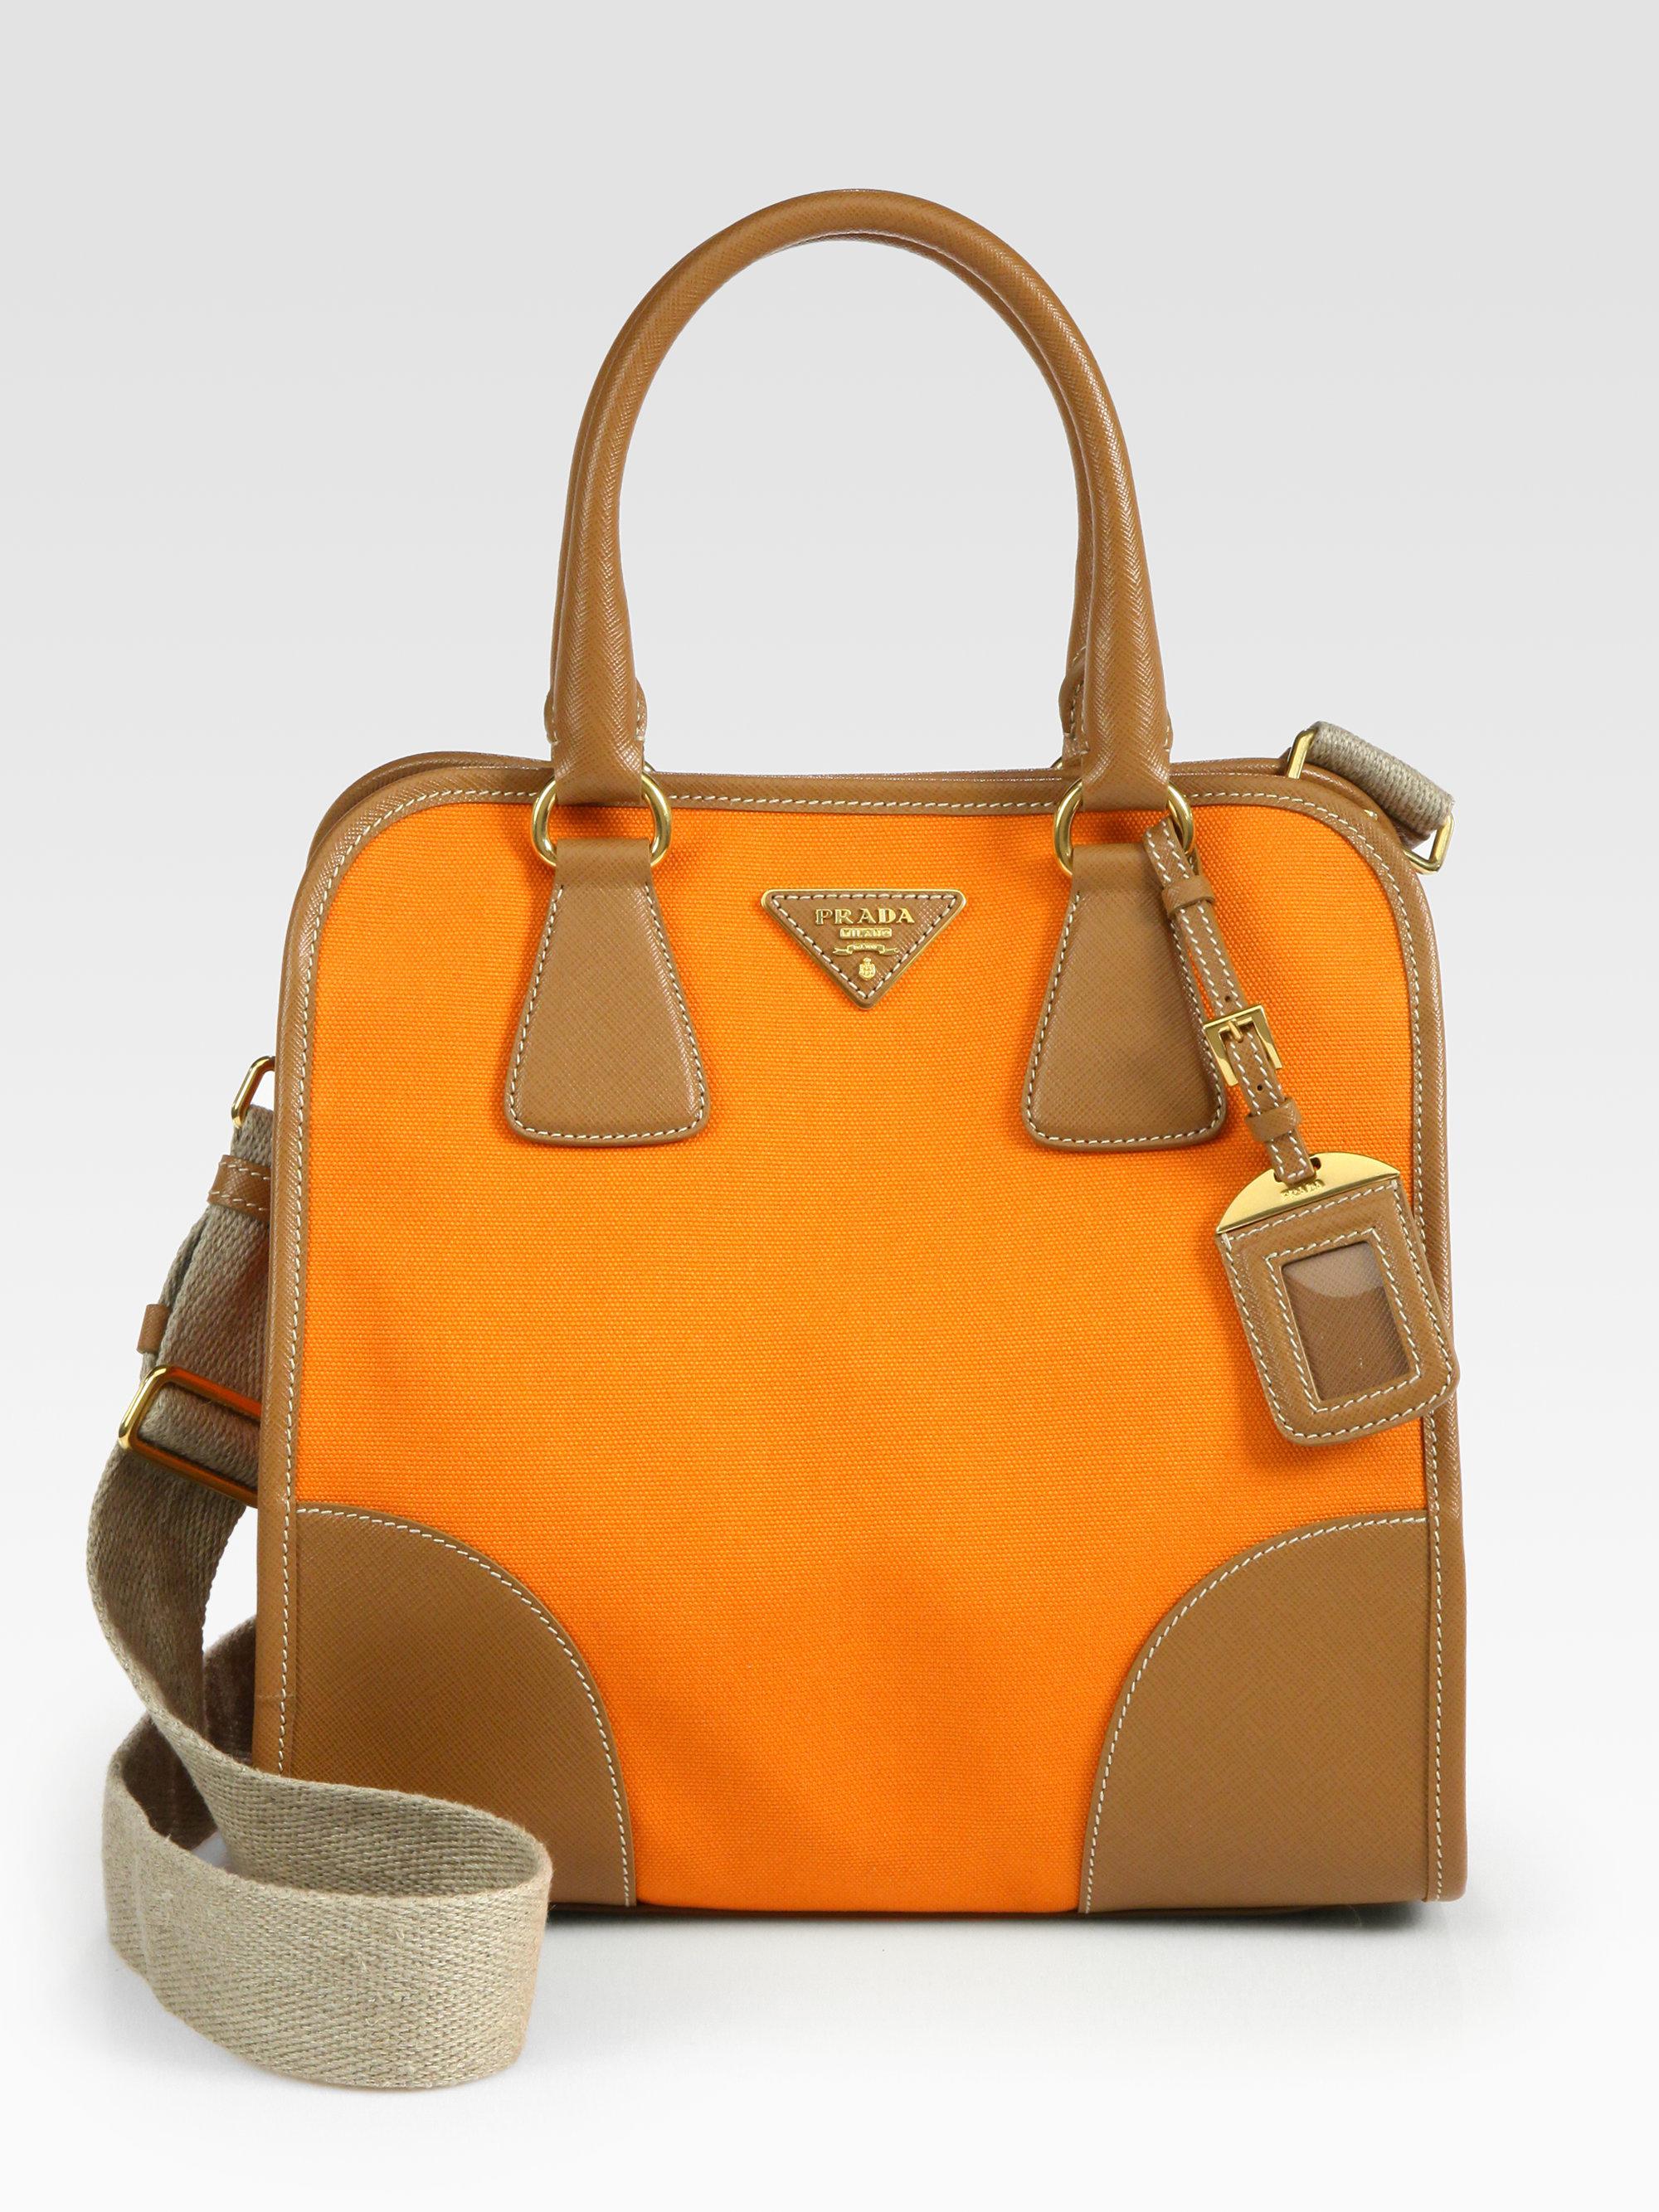 Prada Saffiano Leather Canvas Tote Bag In Papaya Orange